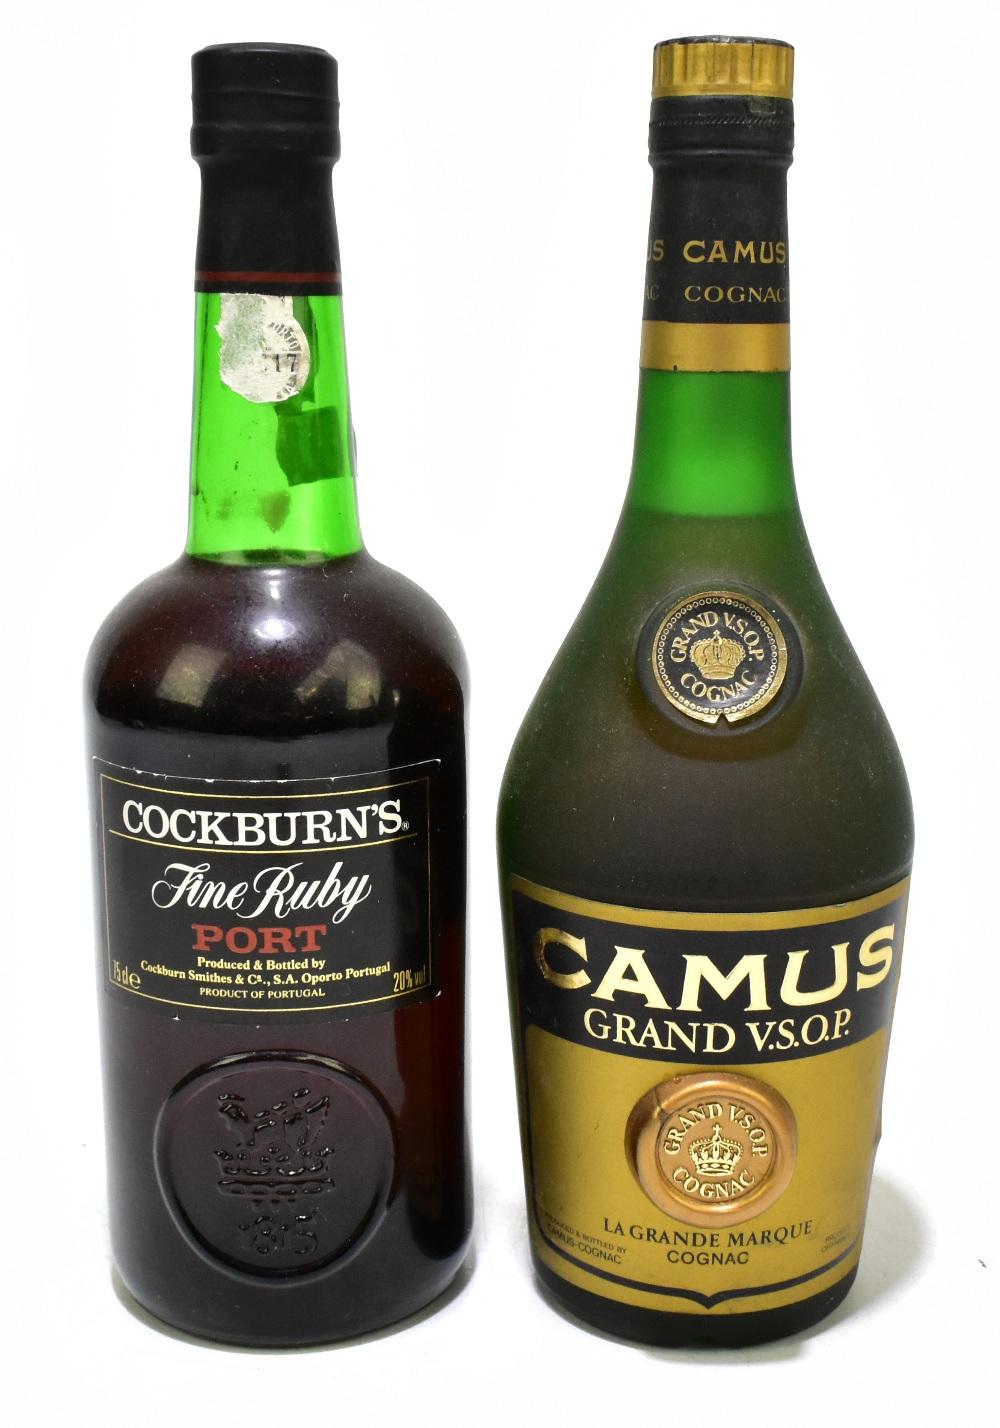 COGNAC; a single bottle of Camus Grand V.S.O.P., also a single bottle of Cockburn's Fine Ruby